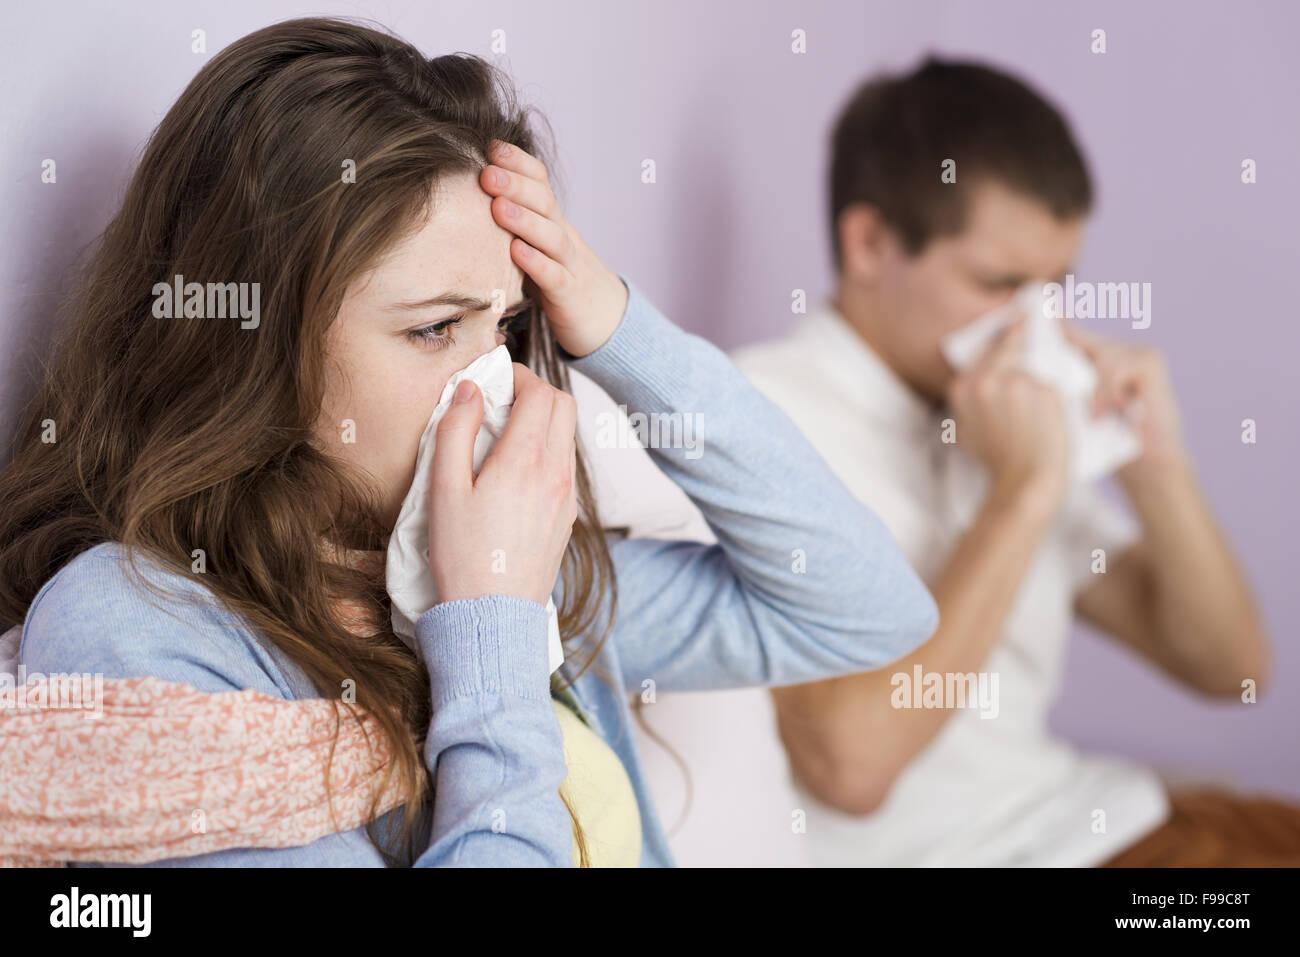 Femme Malade Et L Homme Ont Rhume Grippe Et Une Fievre Elevee